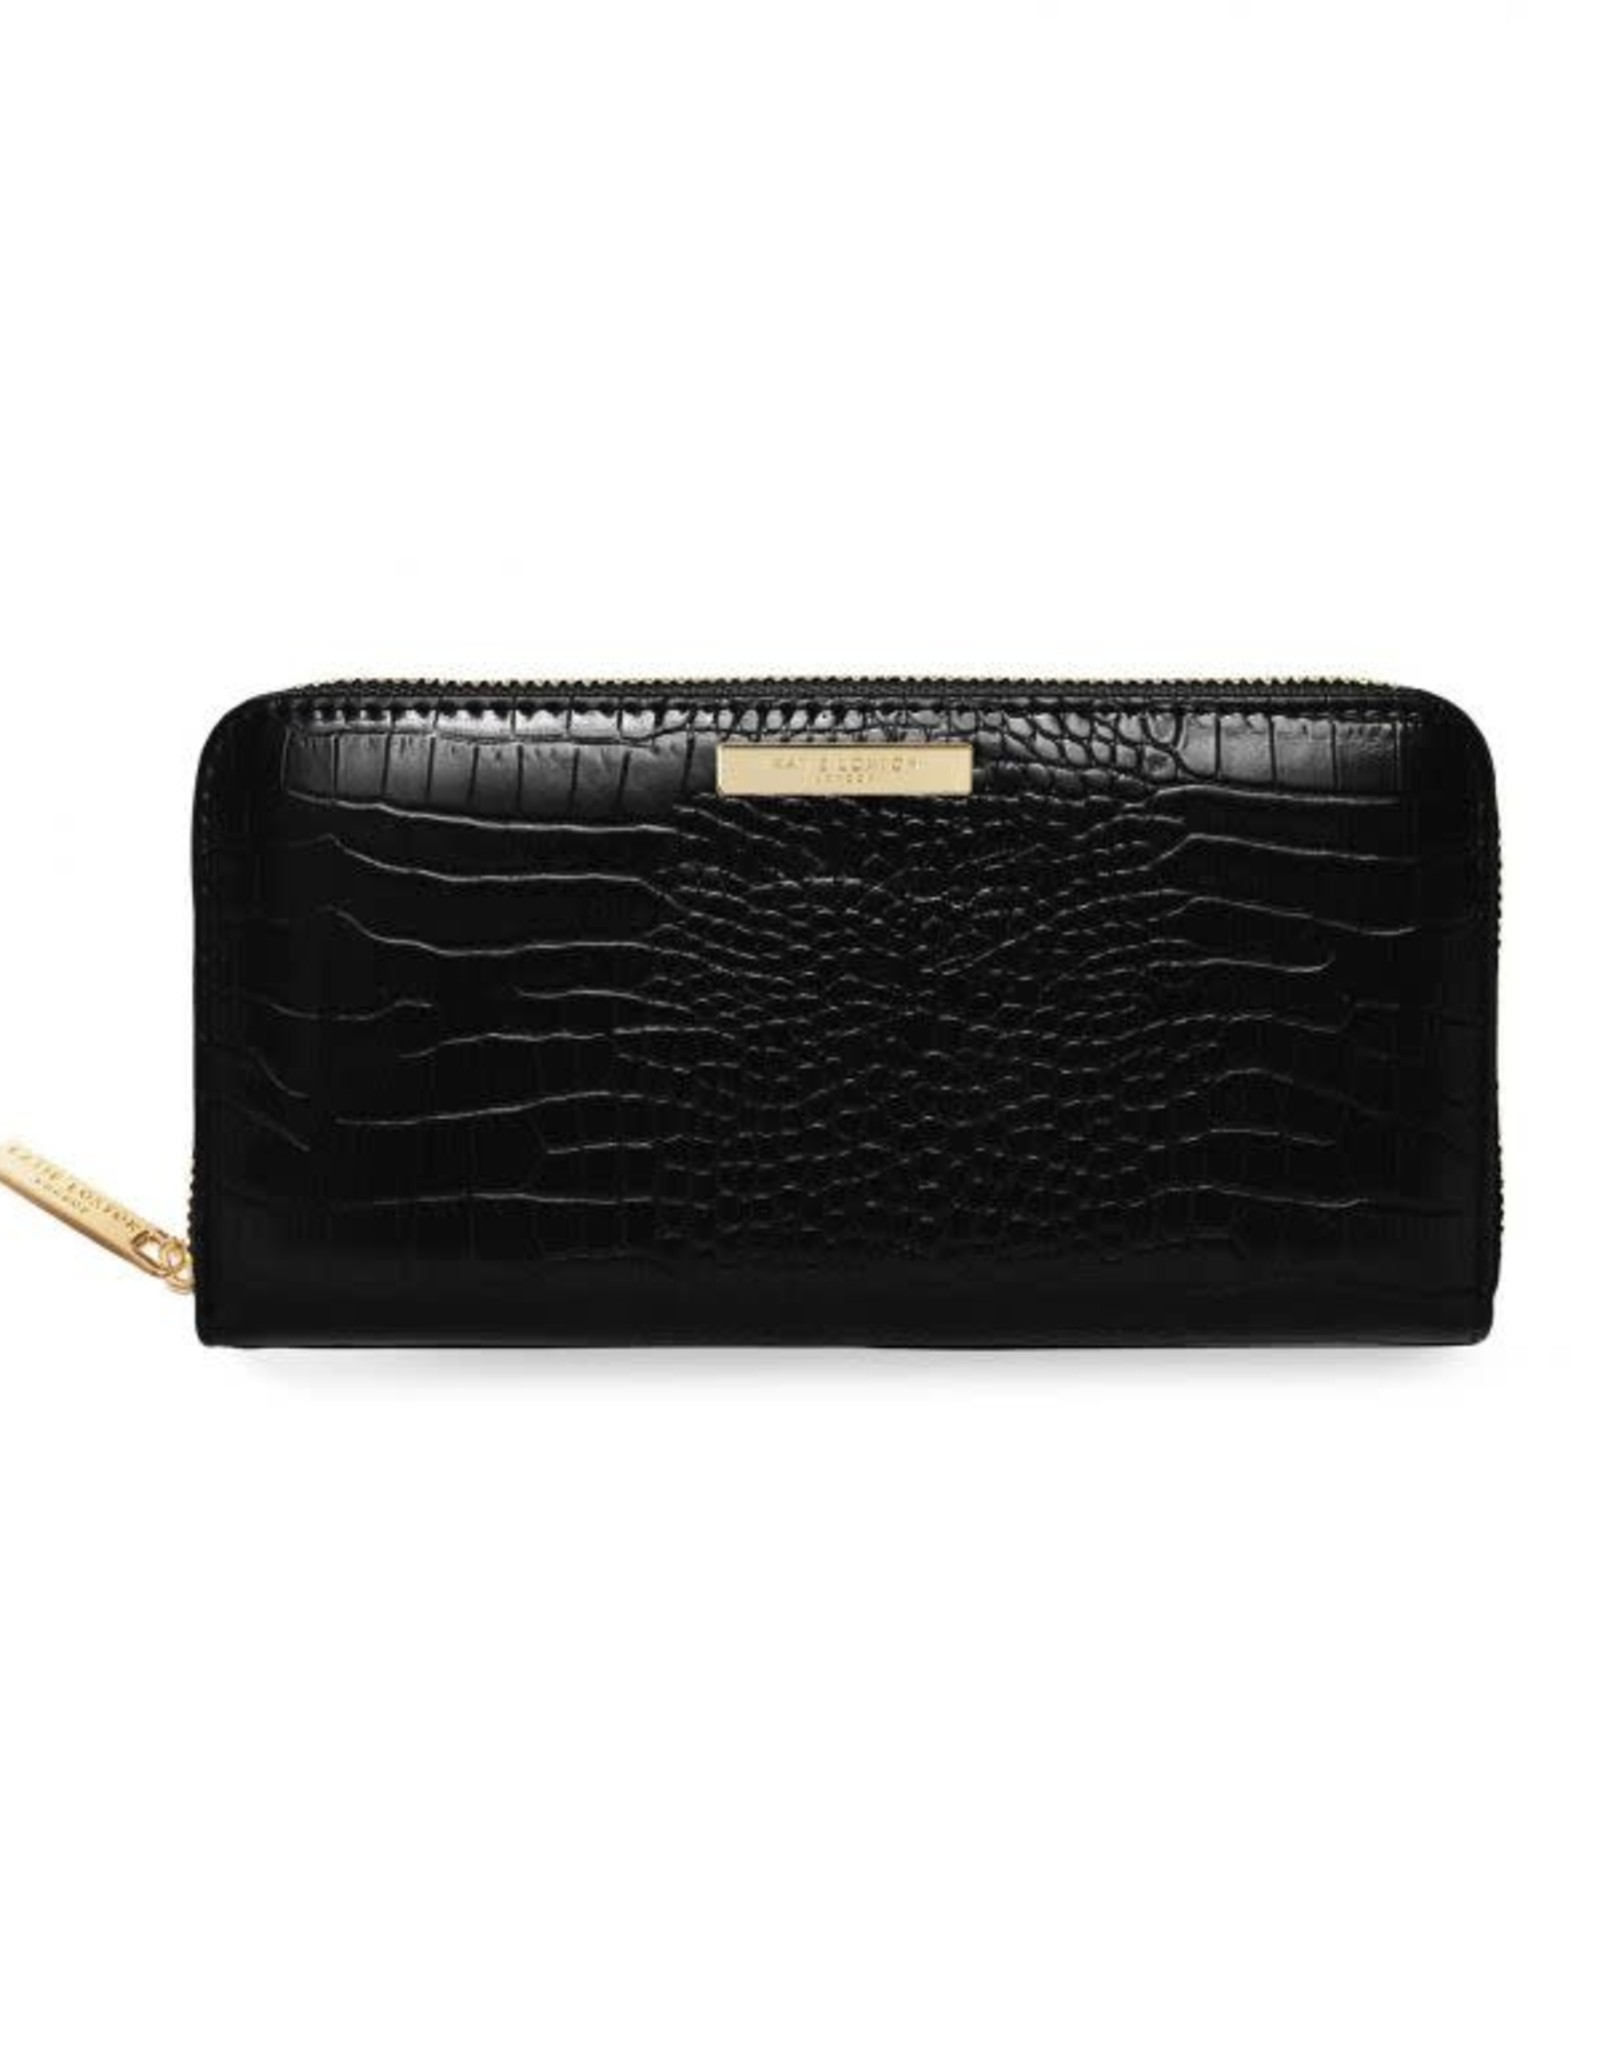 Katie Loxton Celine Croc Wallet - Black